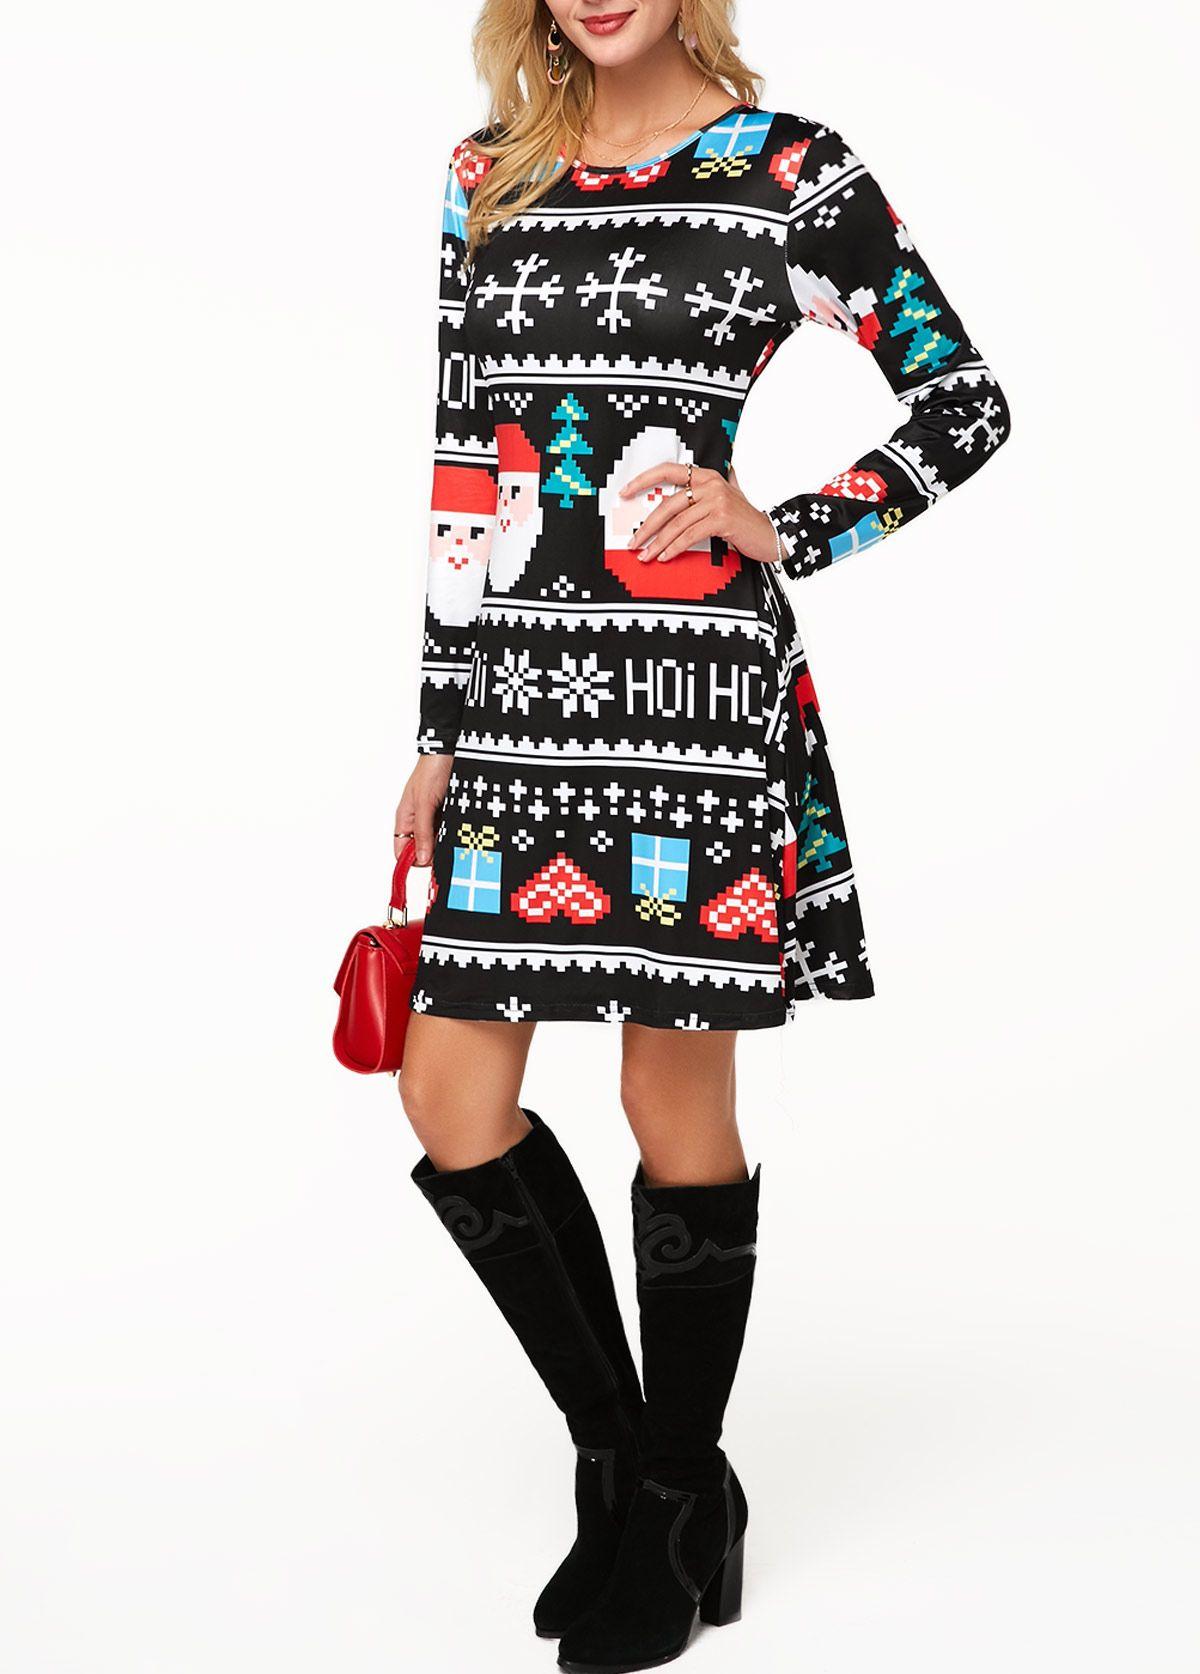 Long Sleeve Christmas Print Round Neck Mini Dress Rotita Com Usd 24 10 Printed Mini Dress Fashion Dresses [ 1674 x 1200 Pixel ]